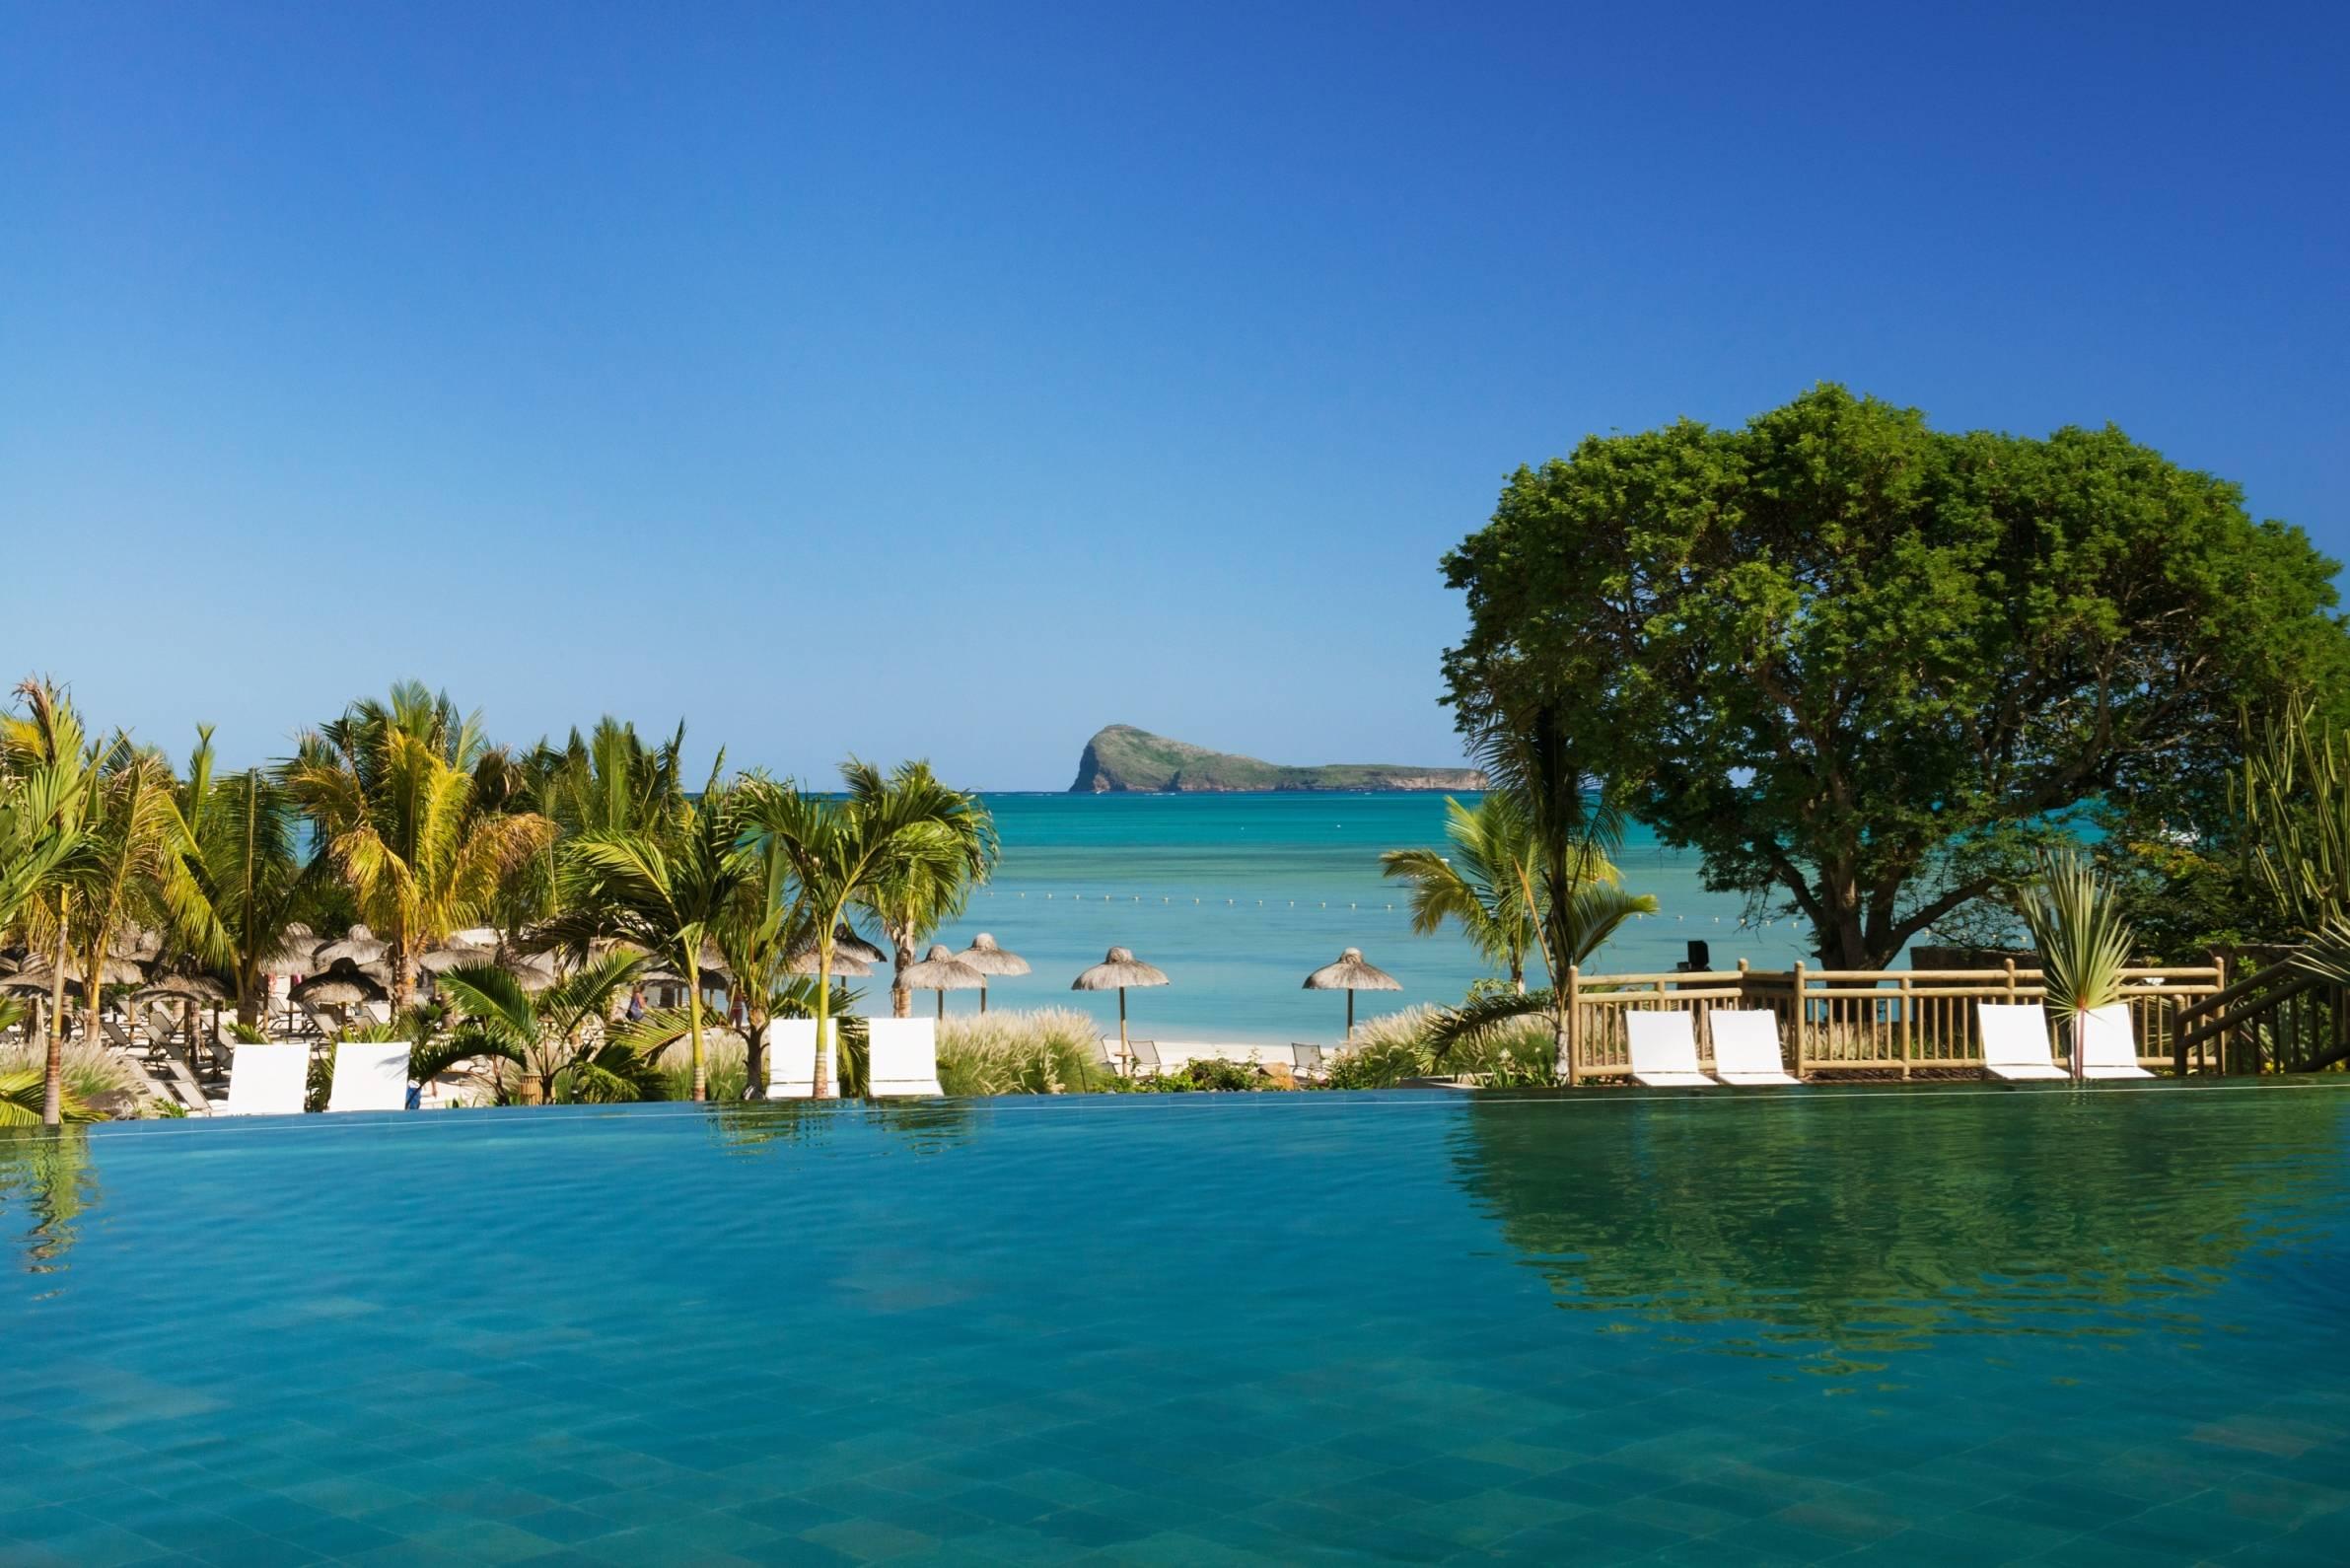 Free dating sites mauritius